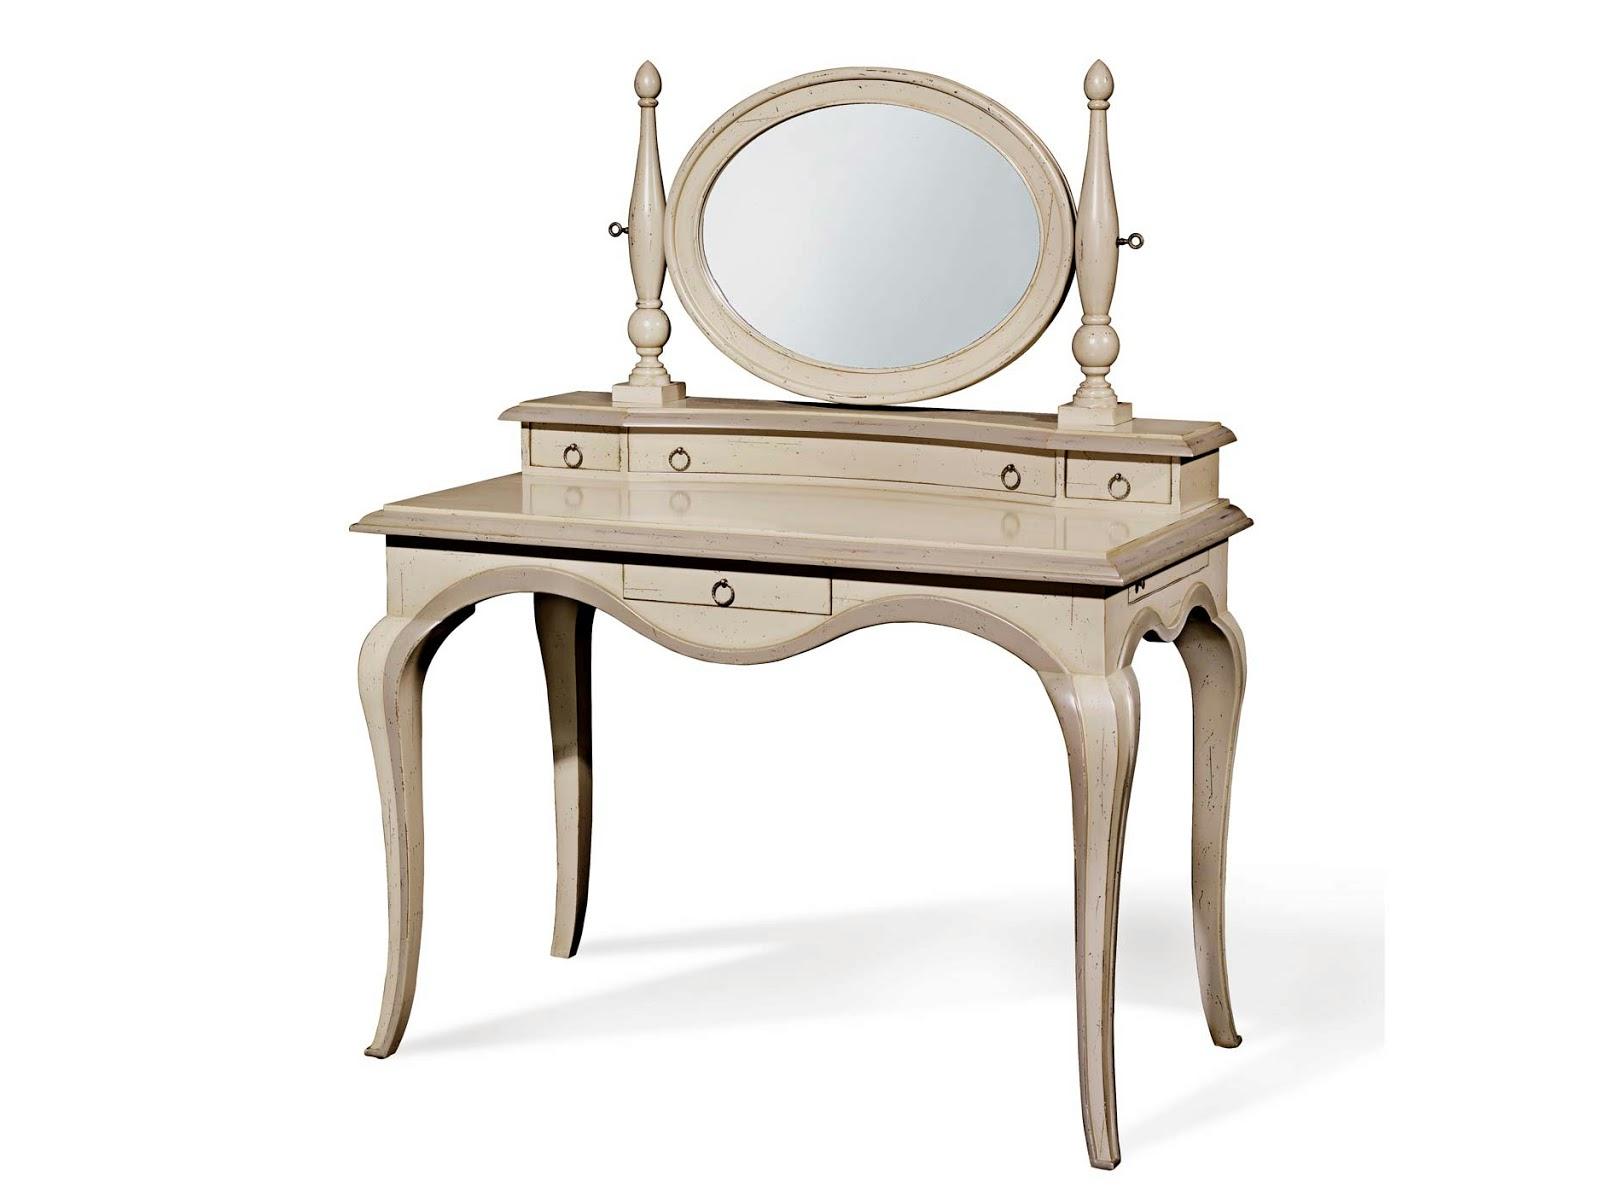 darya girina interior design. Black Bedroom Furniture Sets. Home Design Ideas